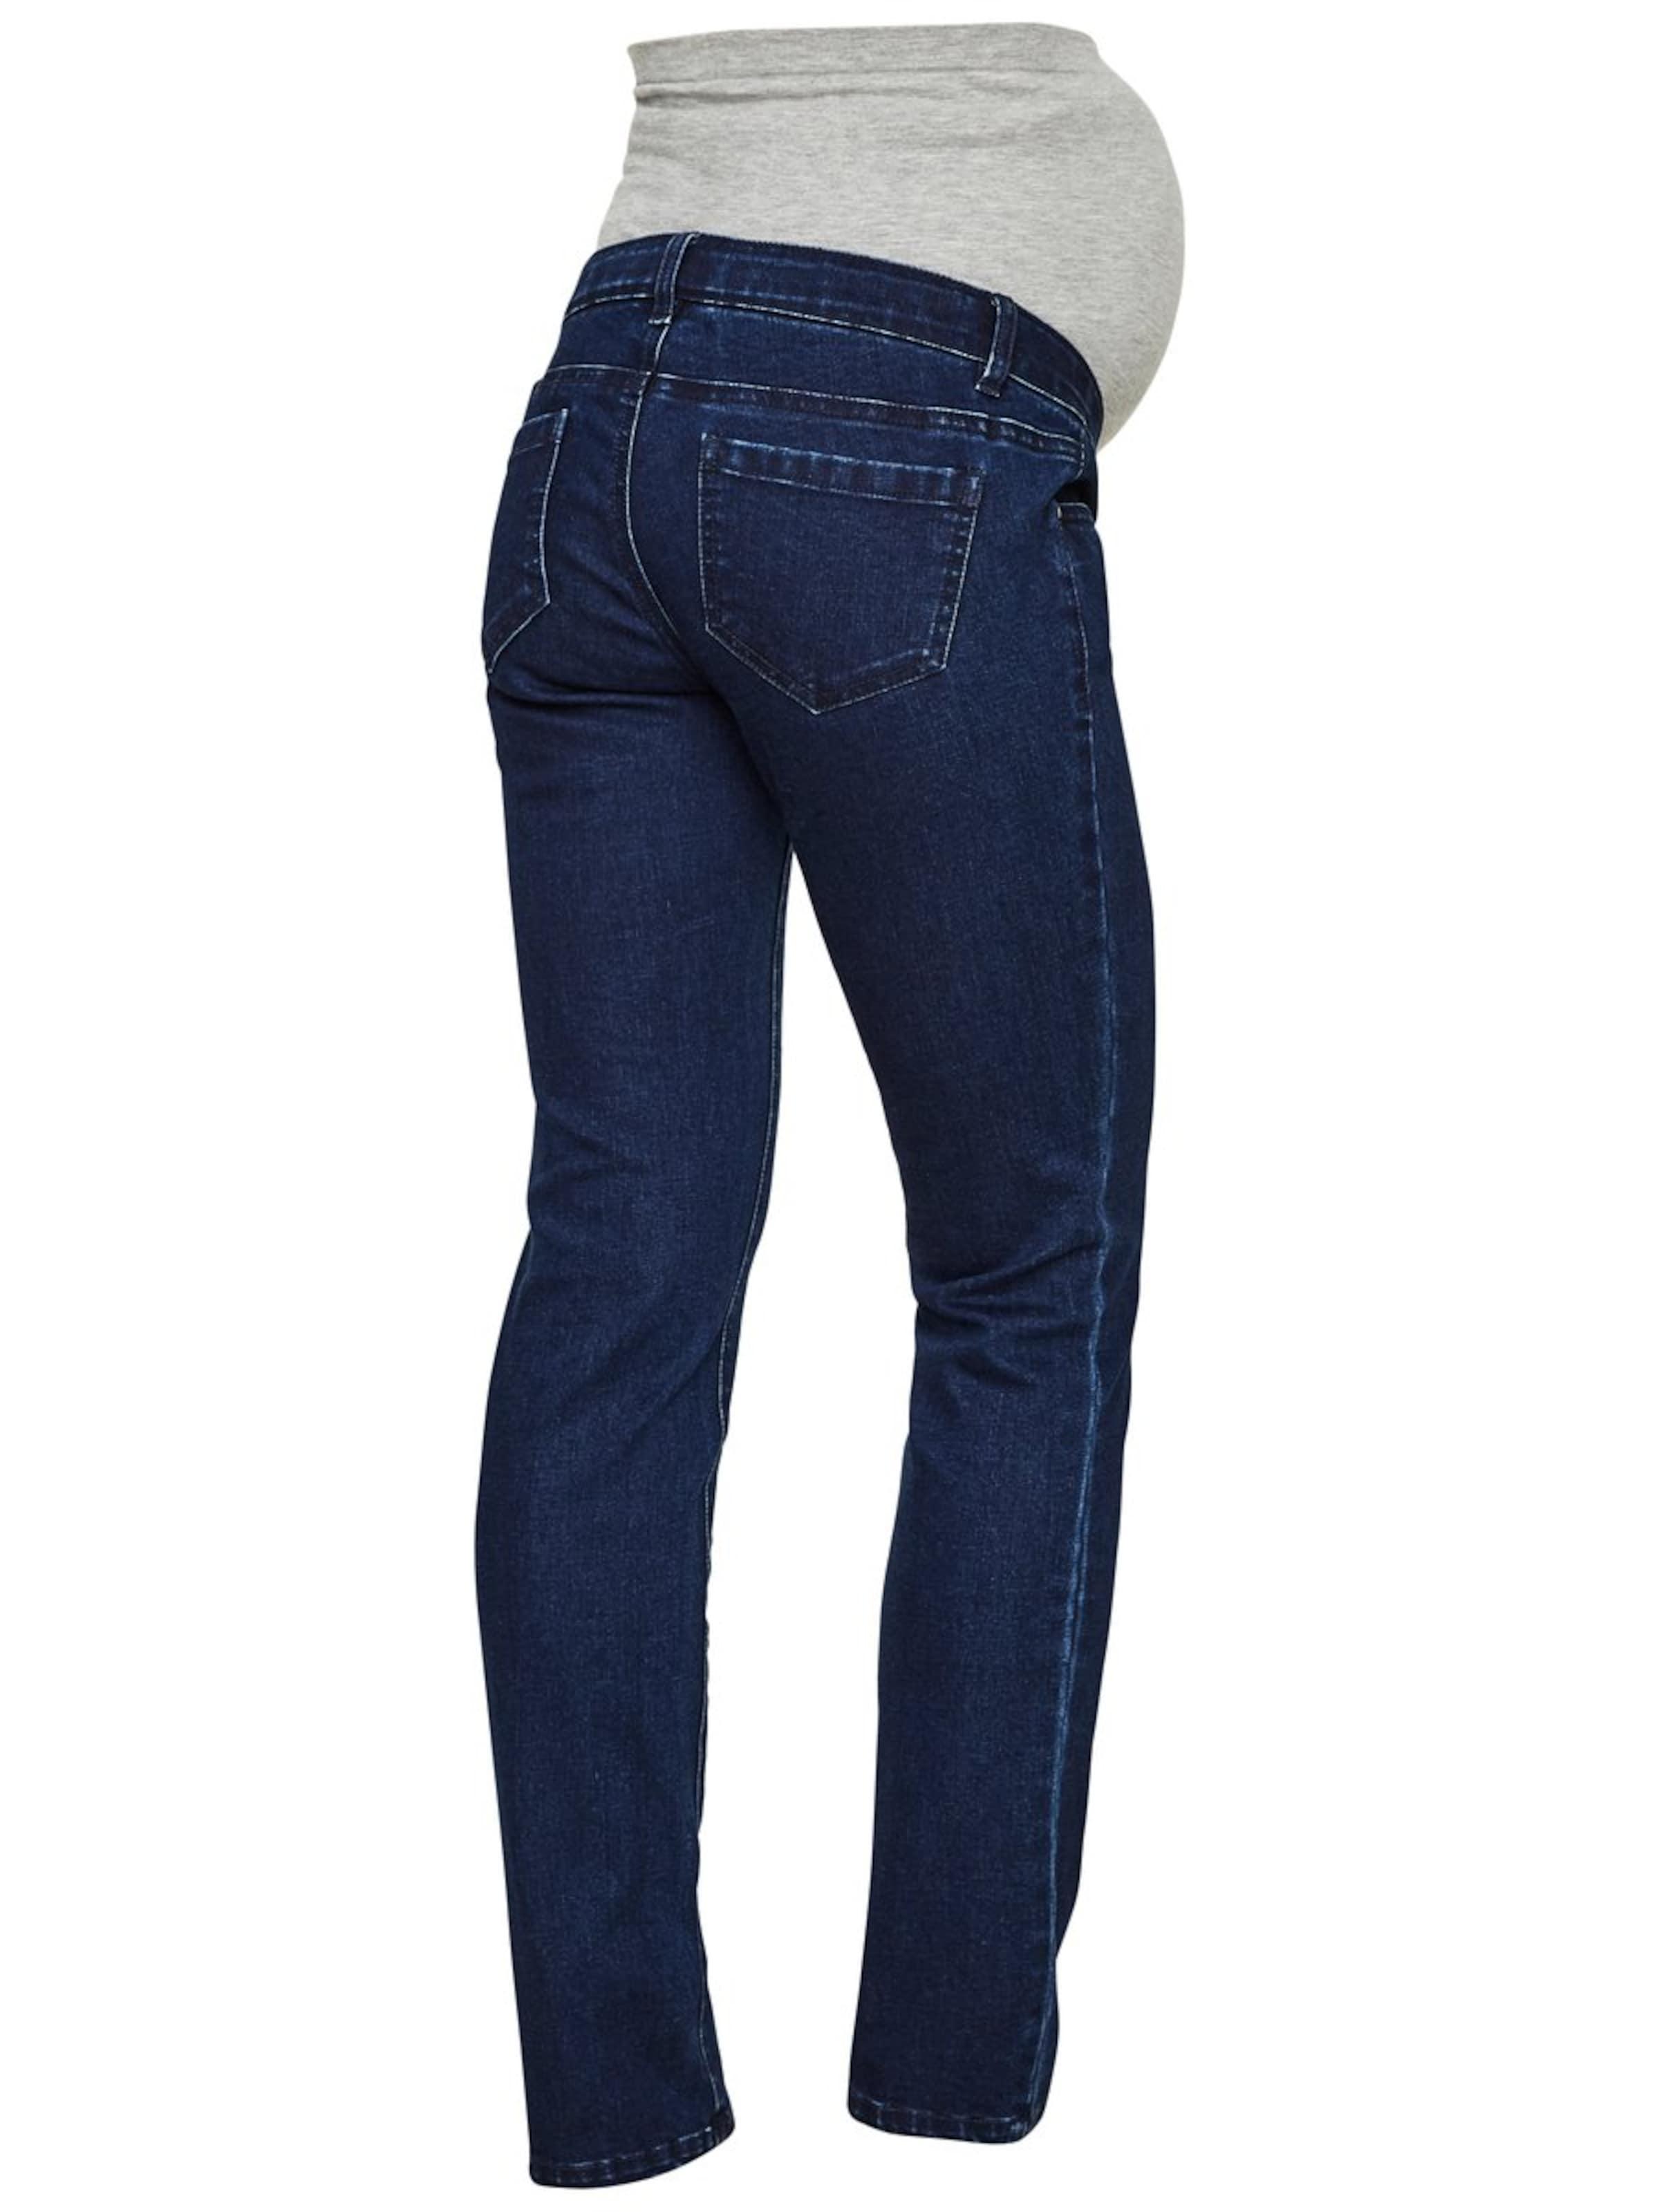 'mllola Blue Mamalicious DamenJeans Noos Straight DenimGrau A' In Unw BrWQdCEoex